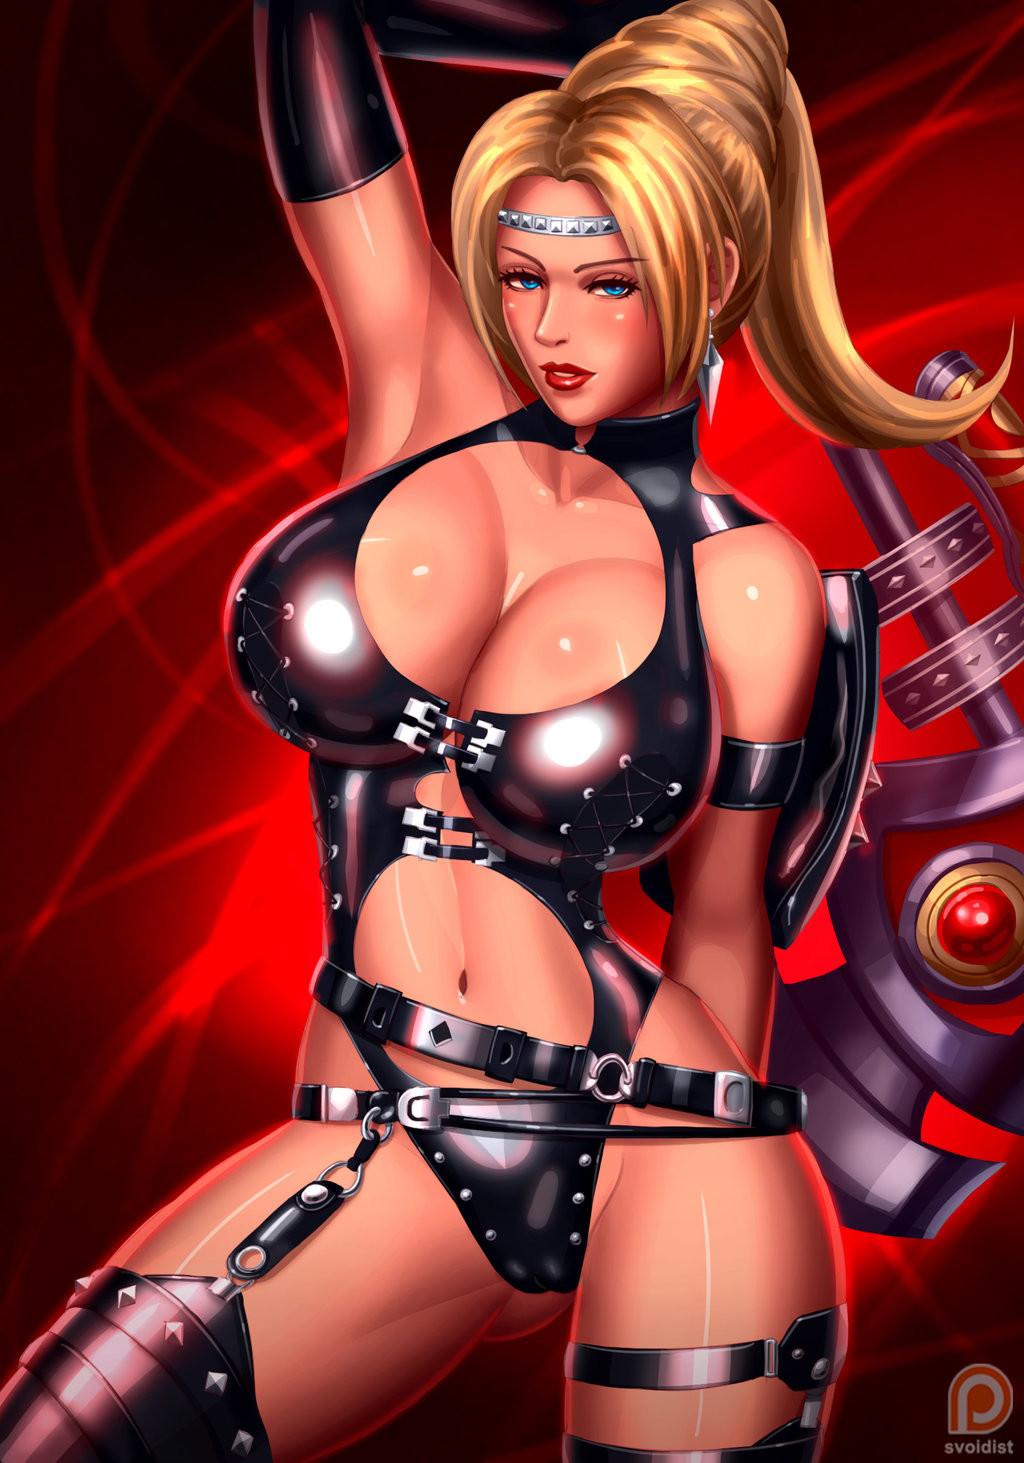 ninja-gaiden-xxx-porn-sperm-in-vagina-gif